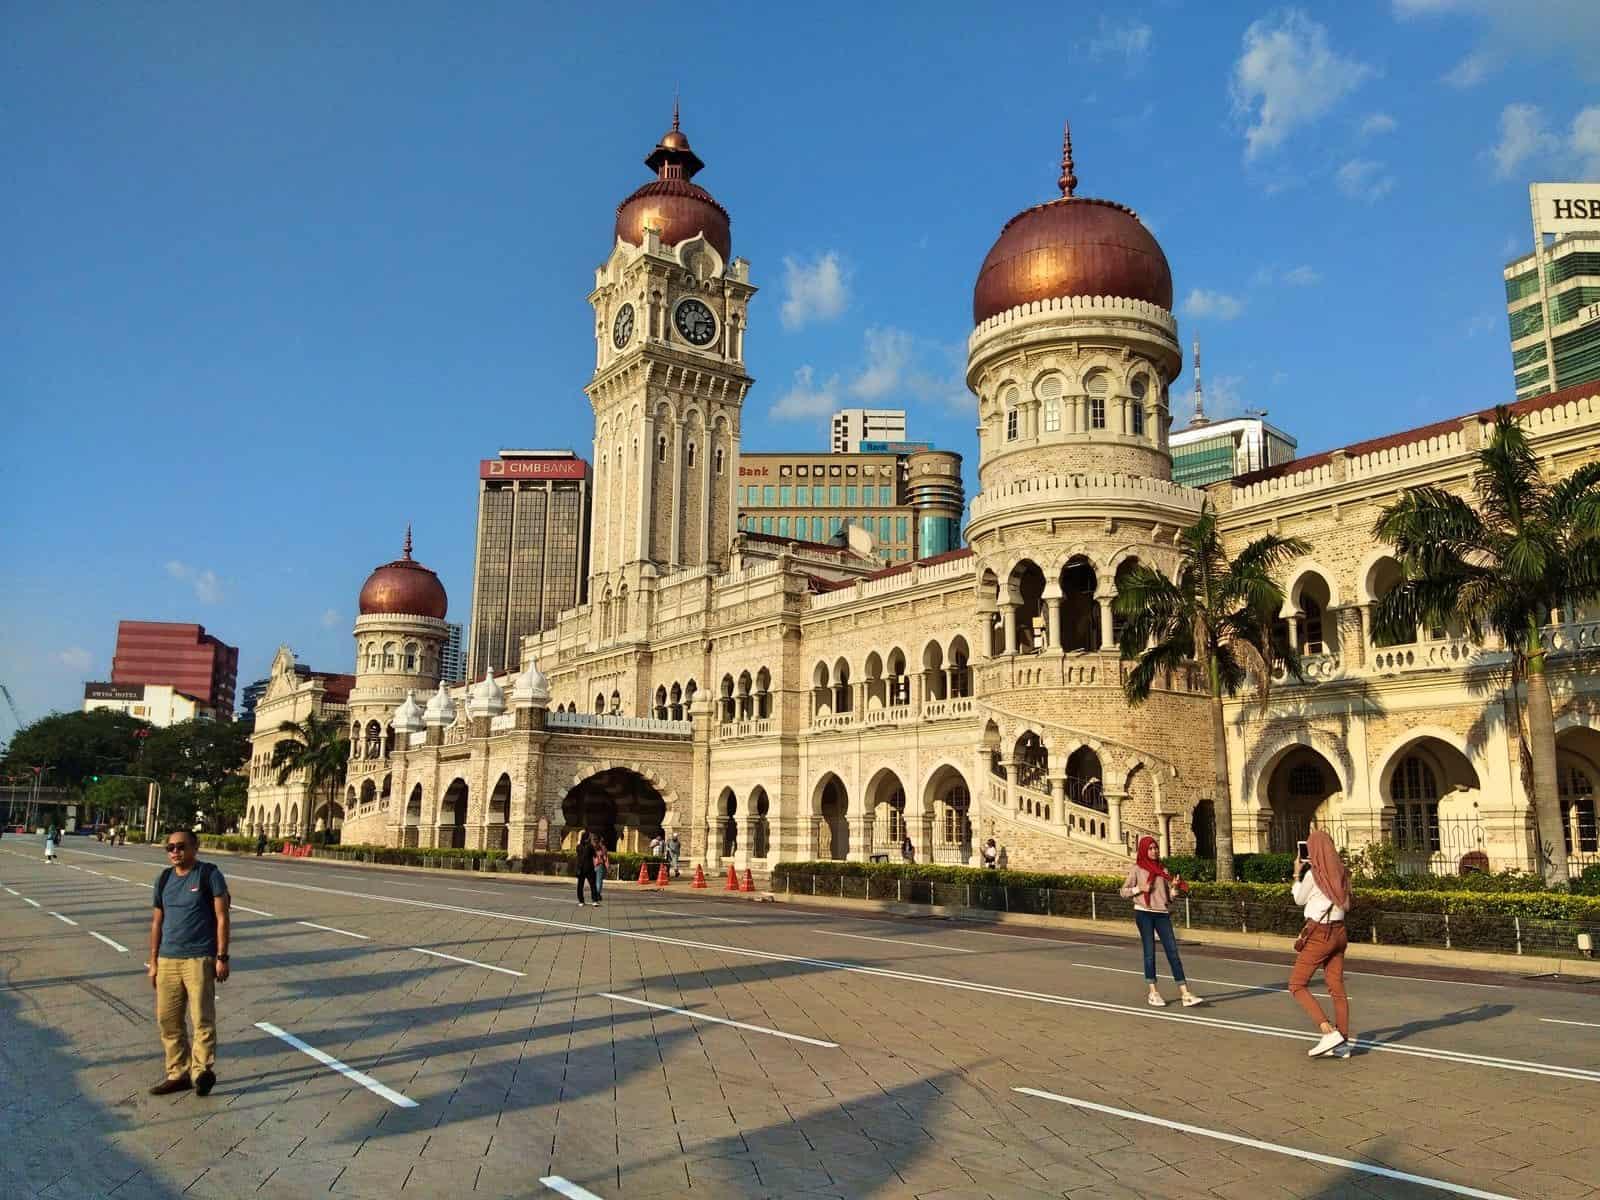 Sultan-Abdul-Samad-Building-Merdeka-Square-Kuala-Lumpur-Malaysia-1 ] Travel Mermaid